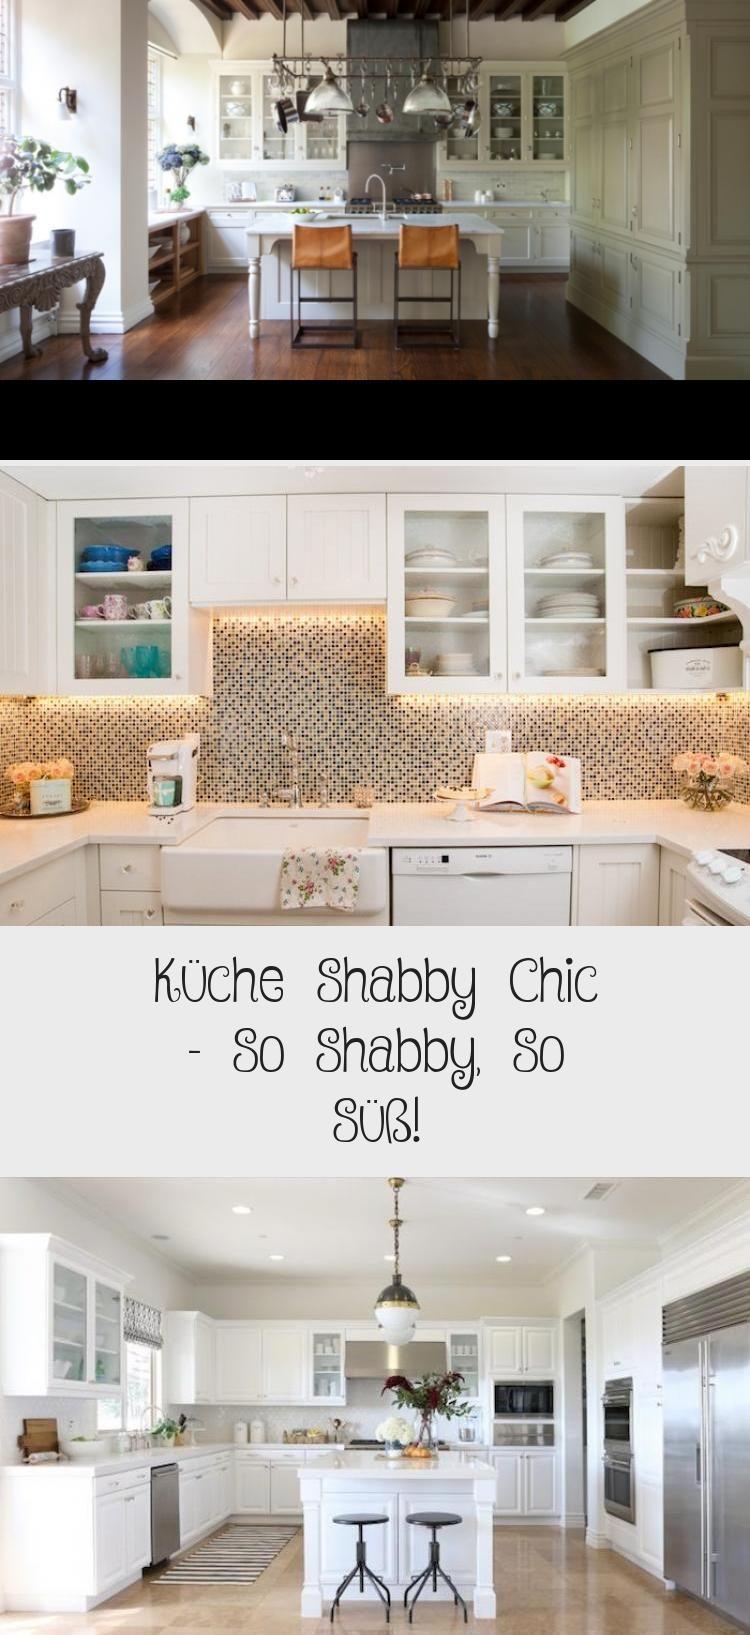 Kuche Shabby Chic 8211 So Shabby So Suss Shabby Chic Kuche Shabby Shabby Chic